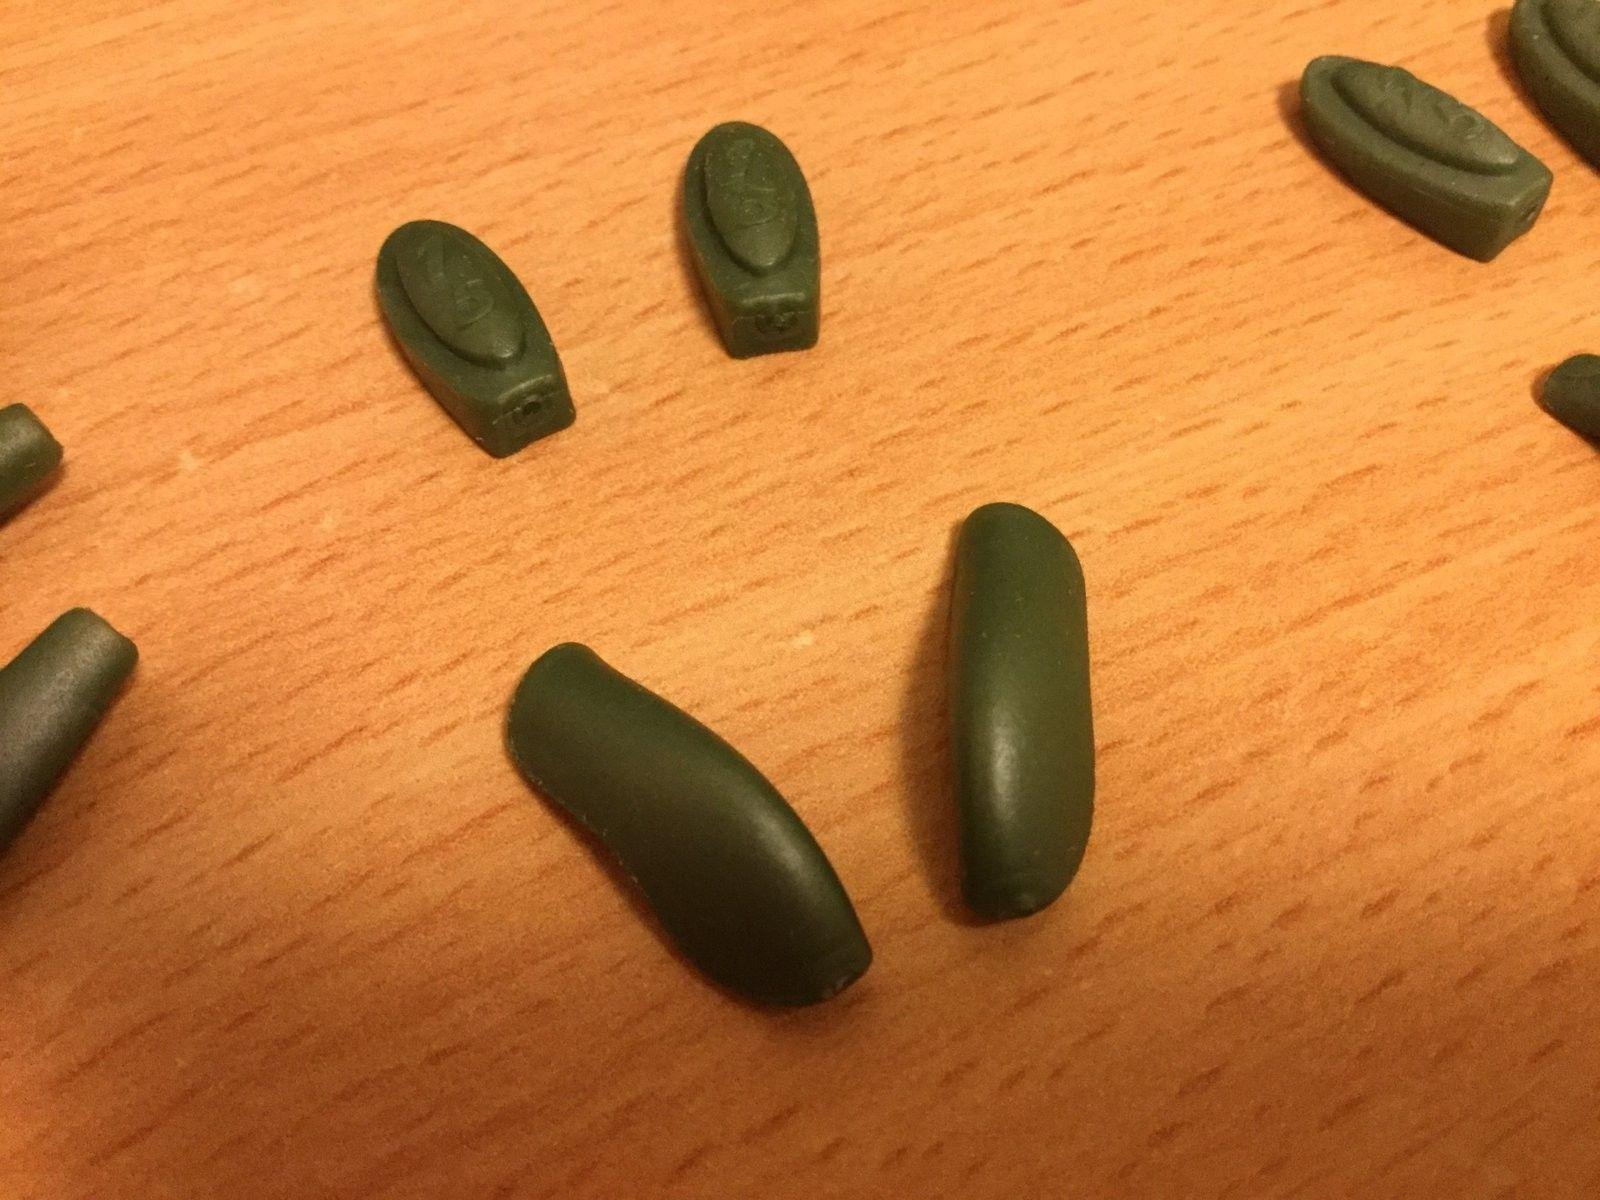 Ichiro Polished Emerald -  lens, rubber! - IMG_1625.JPG